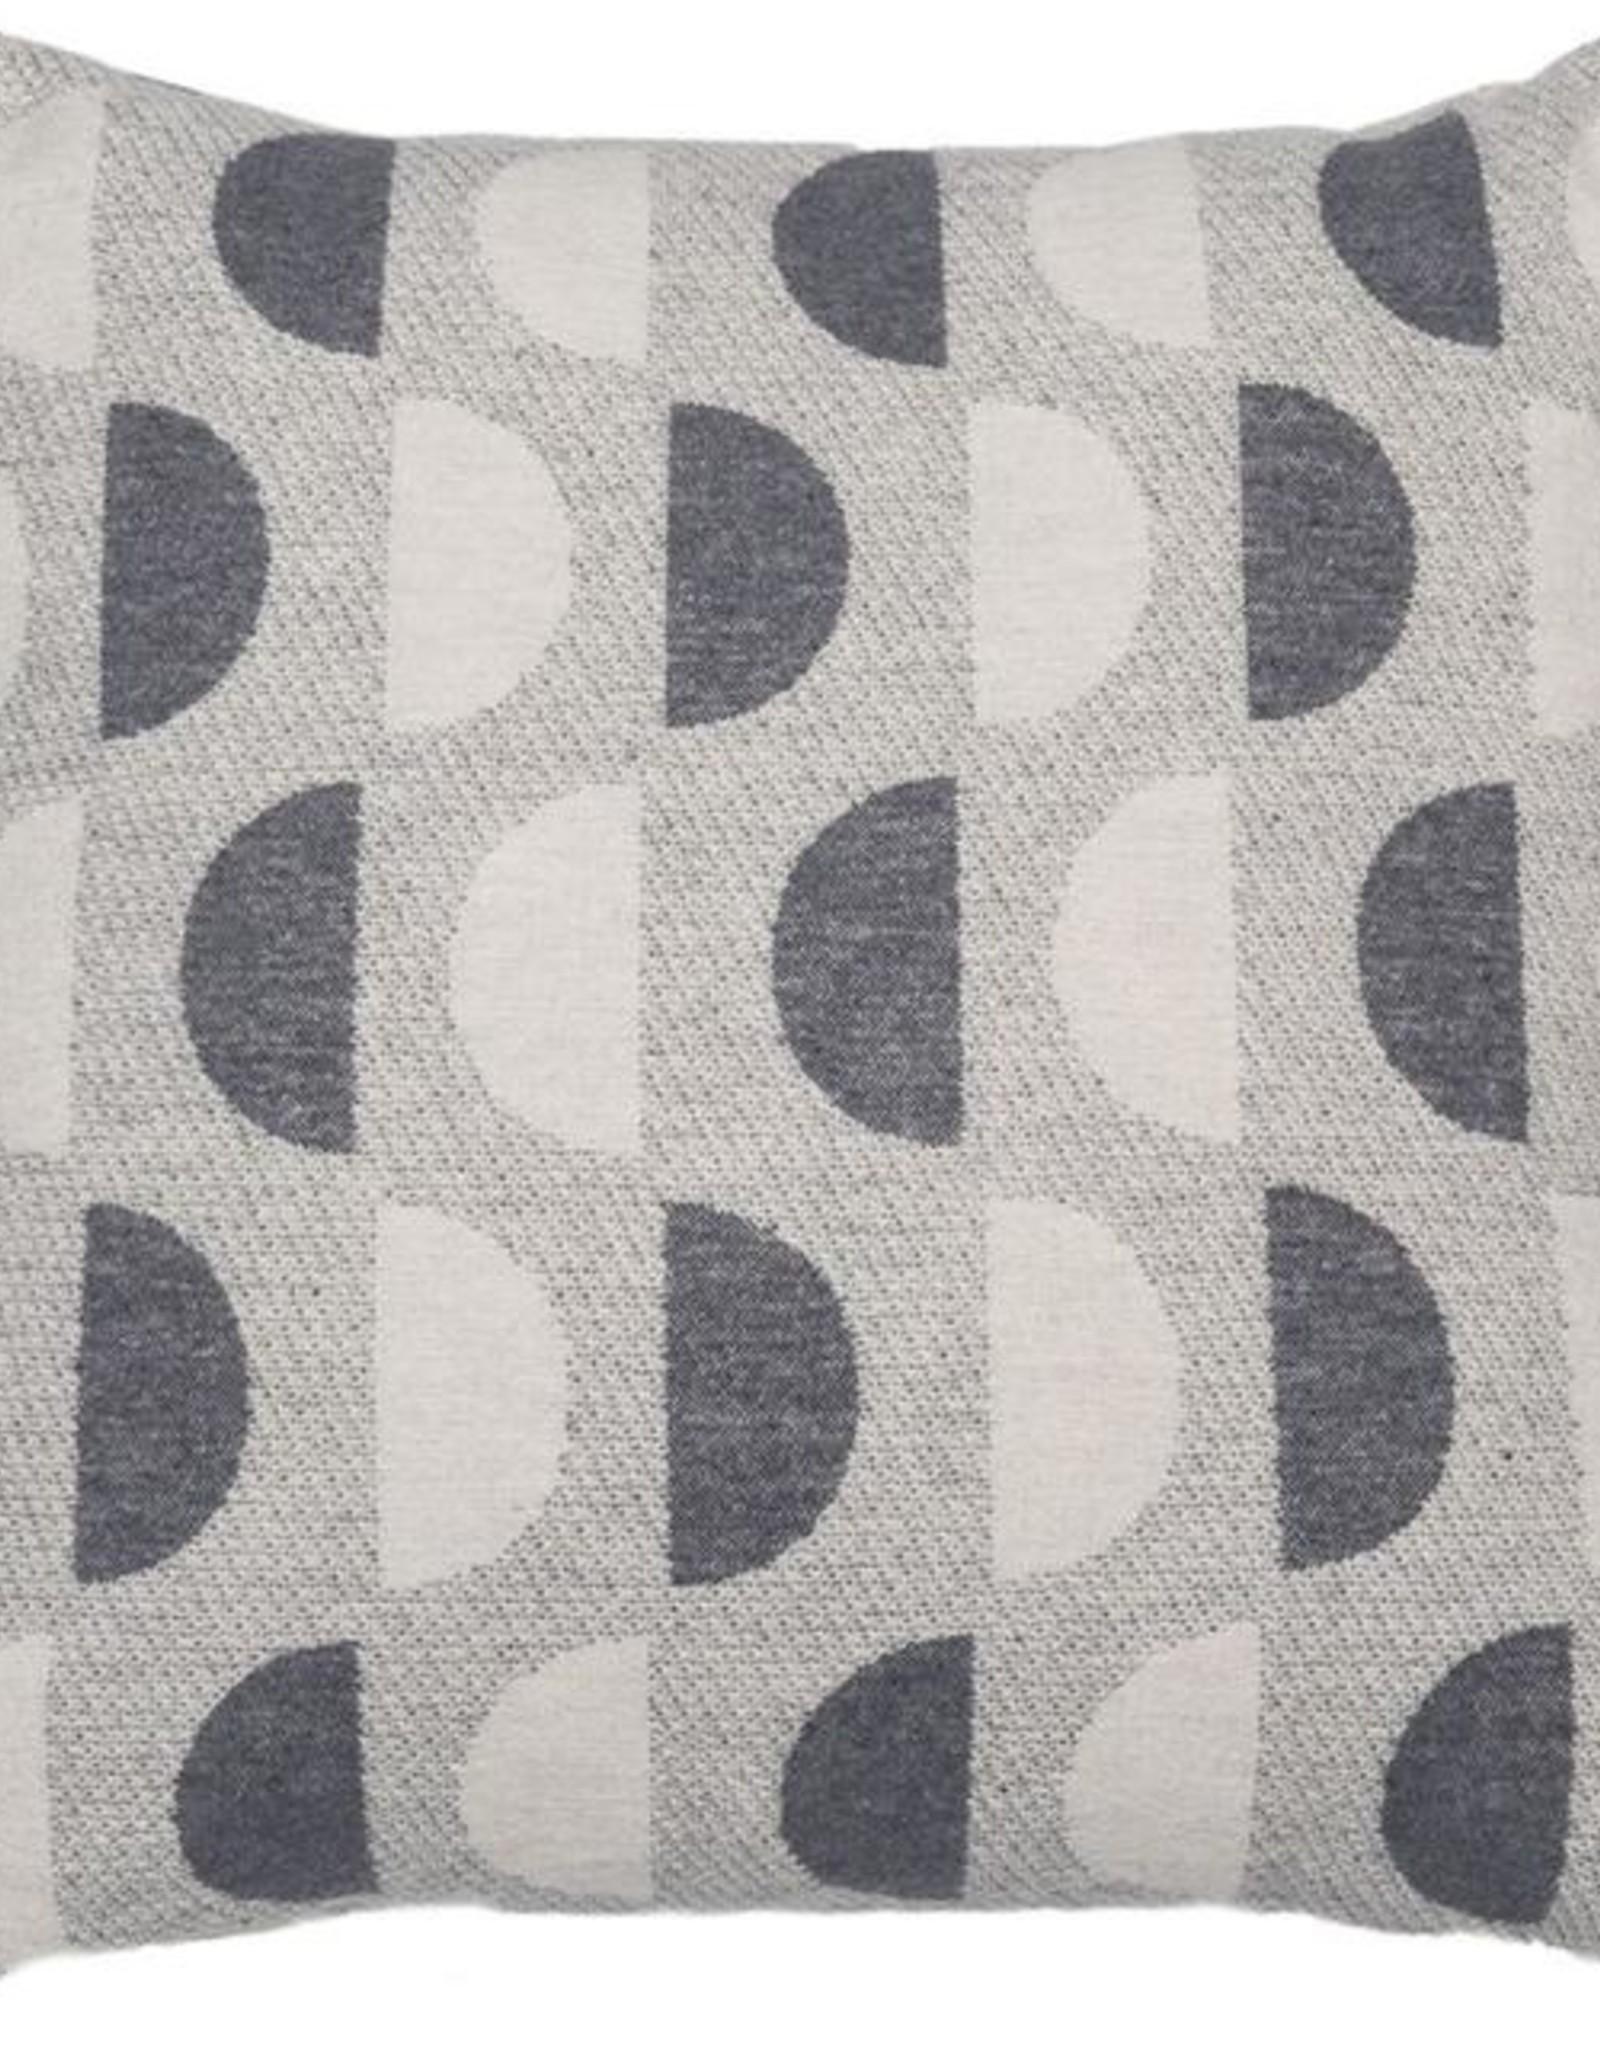 DFT DFT Cushion-Half Circles